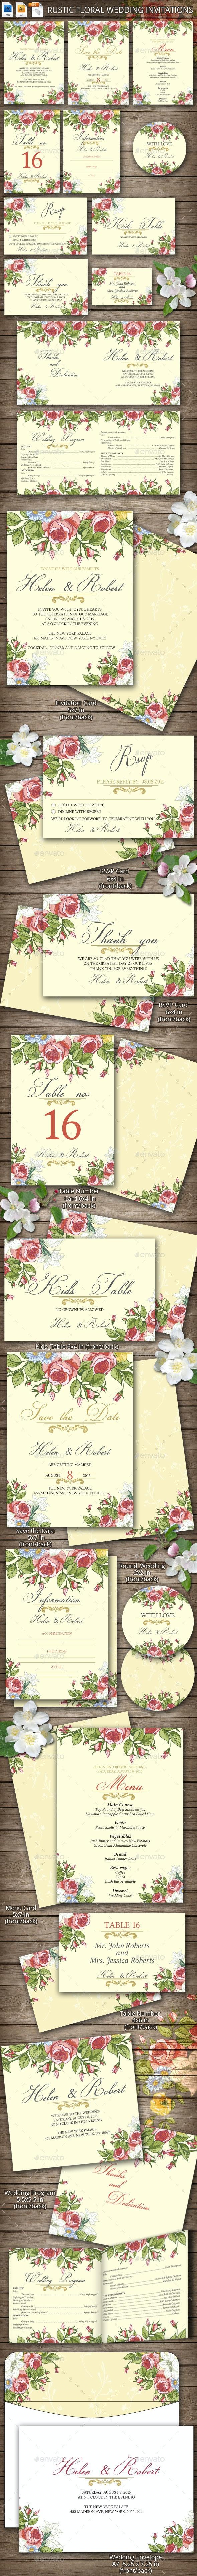 Wedding - Weddings Cards & Invites